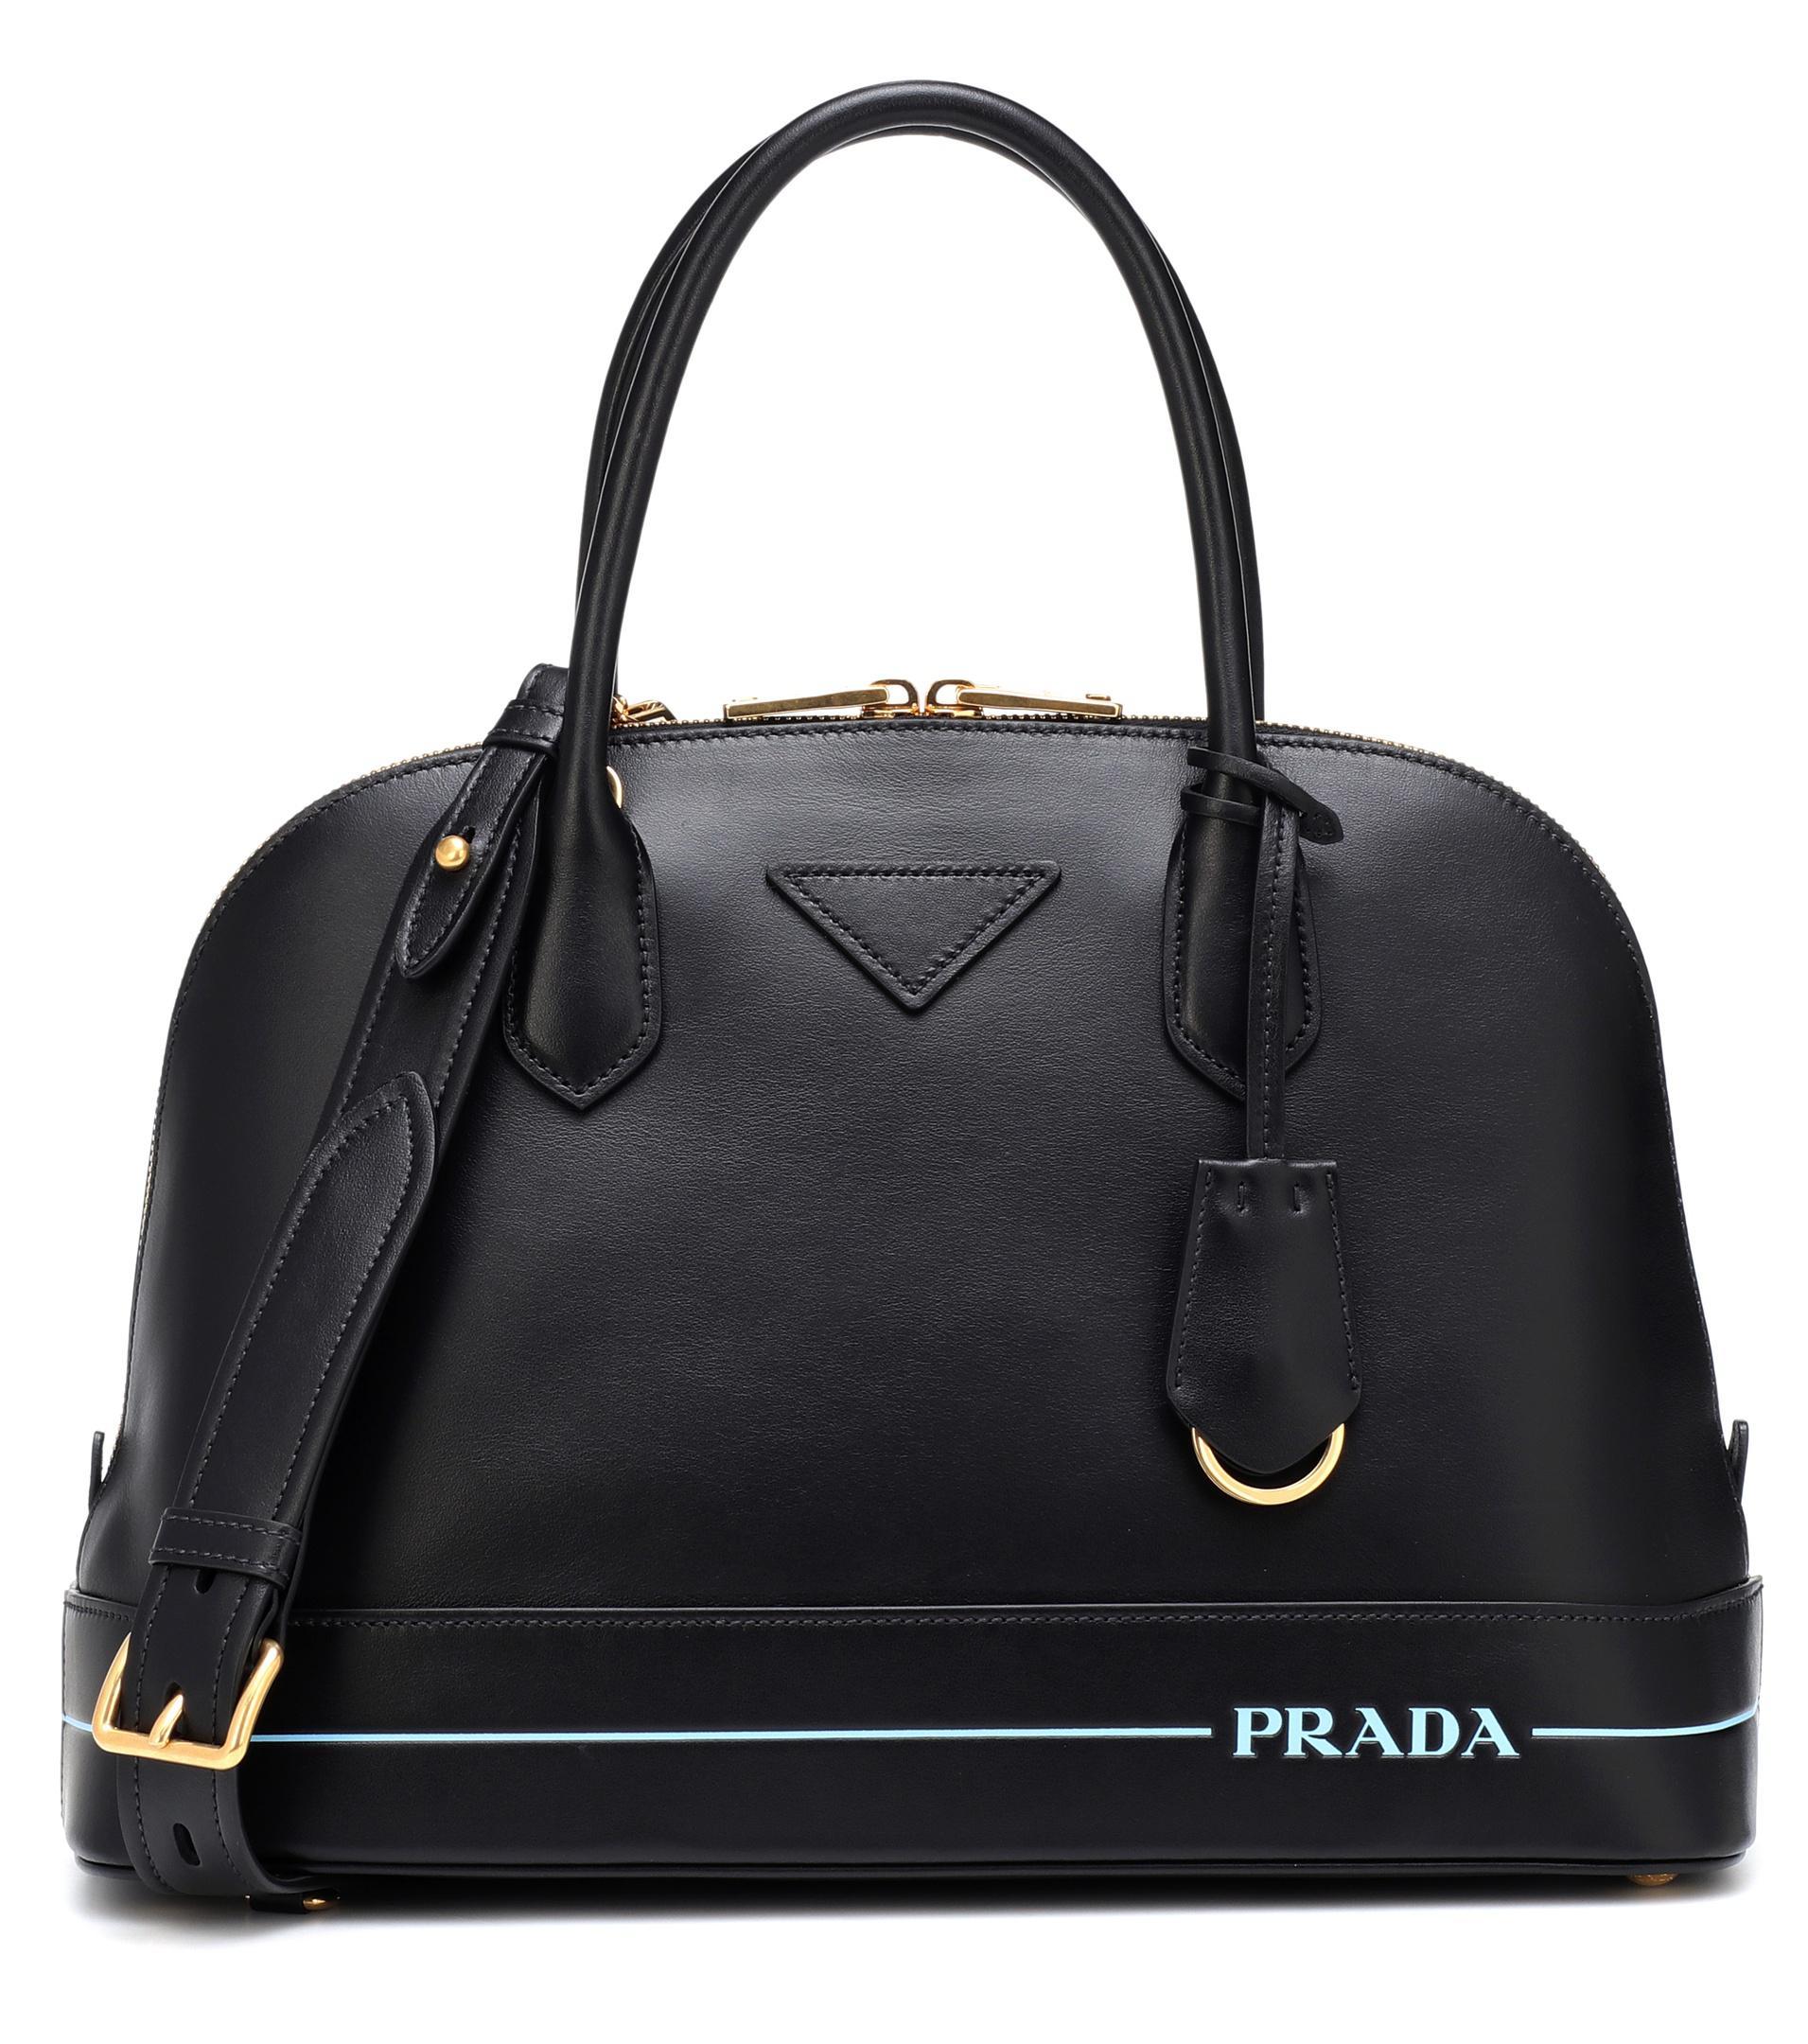 ccabdfa9c55047 Lyst - Prada Mirage Leather Shoulder Bag in Black